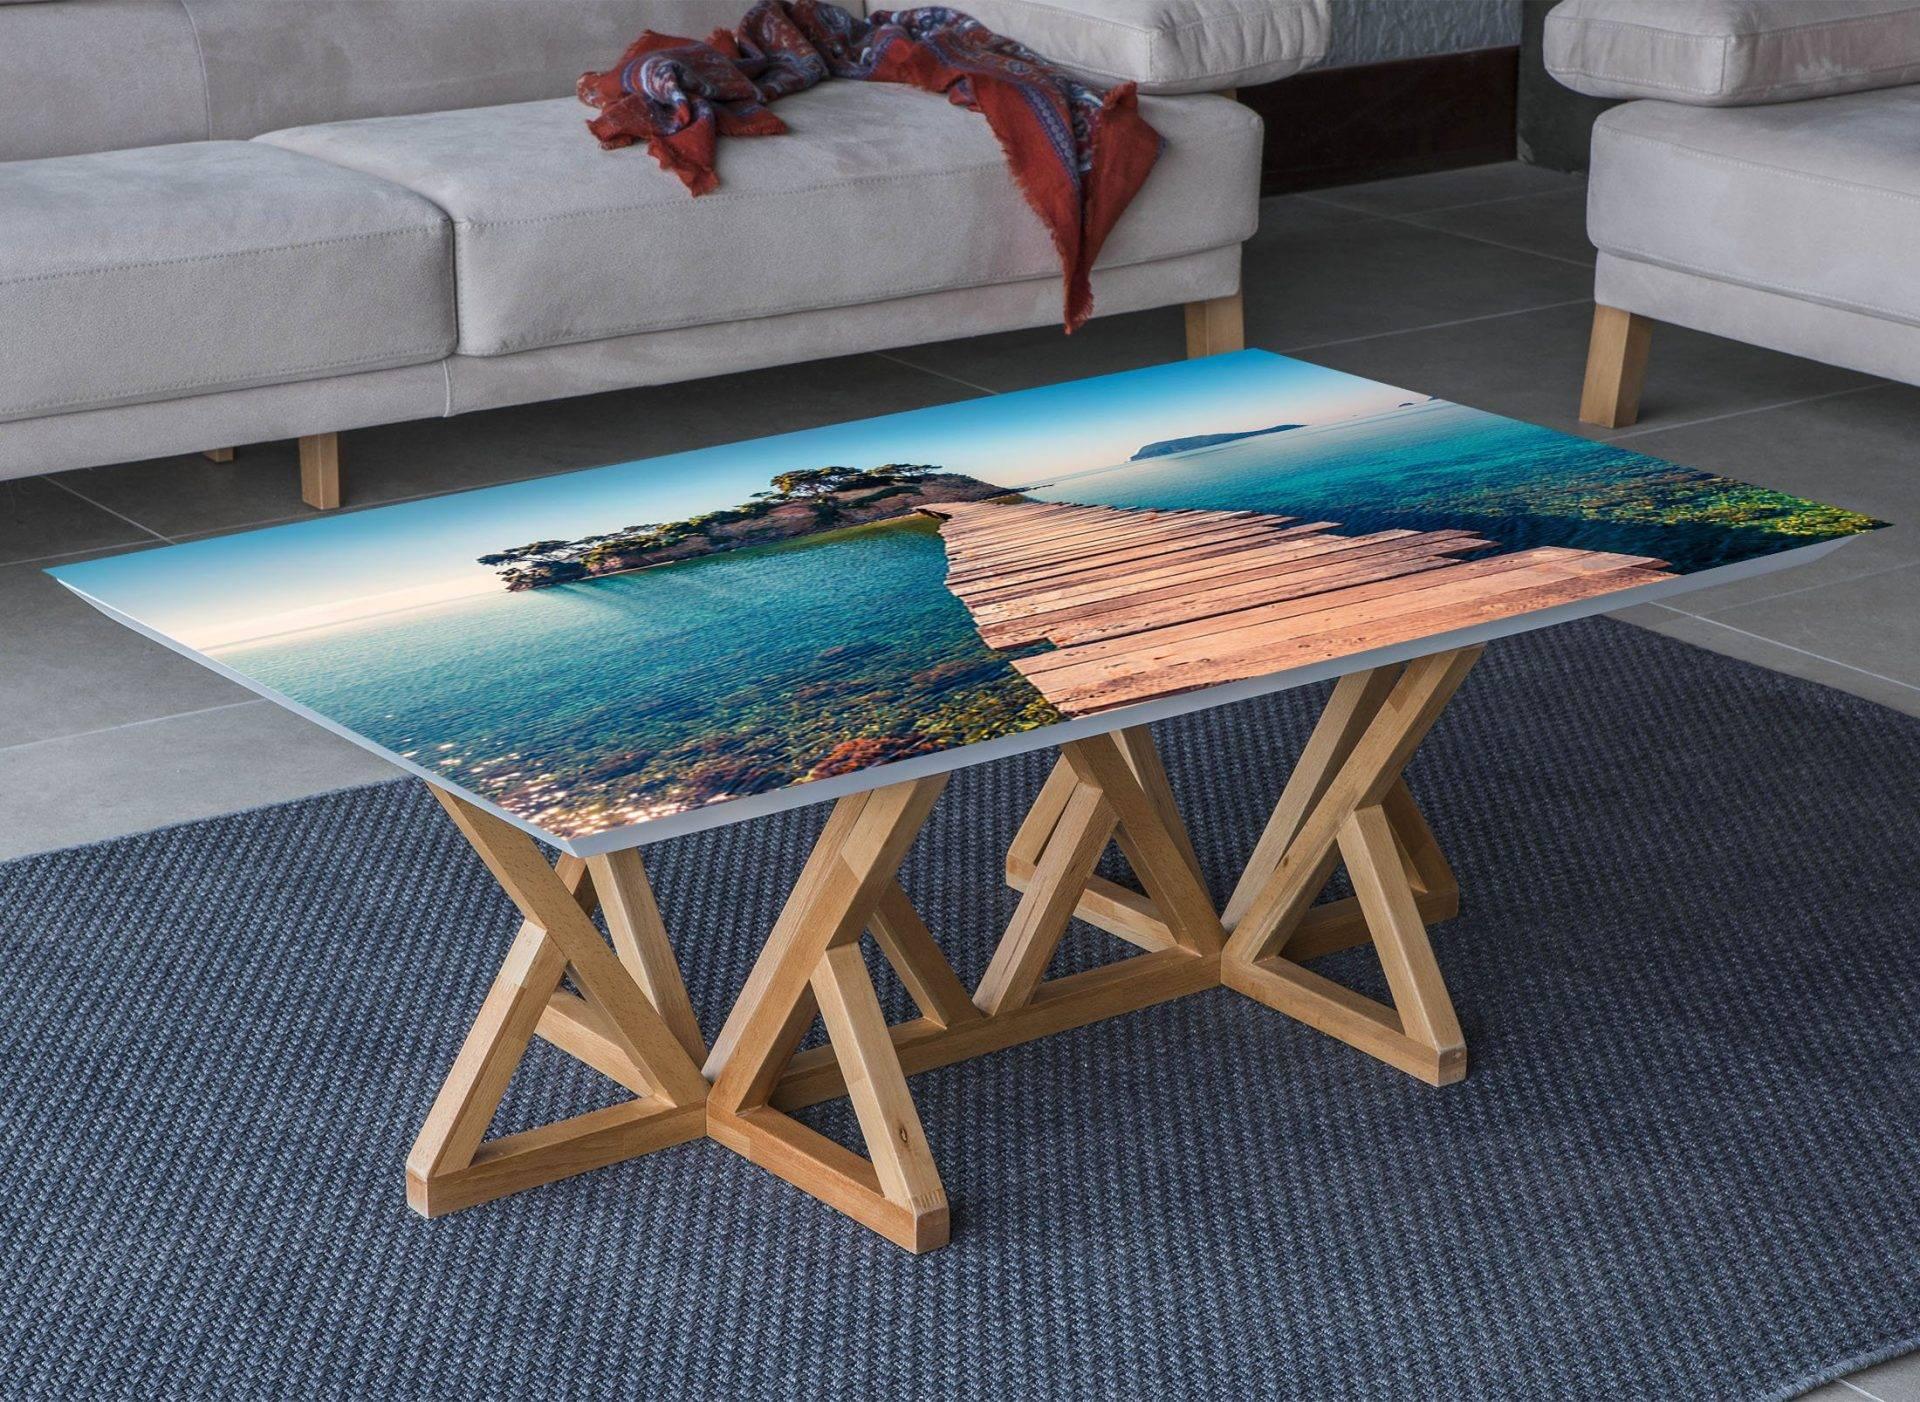 Island Ocean Bridge Laminated Vinyl Cover Self-Adhesive for Desk and Tables